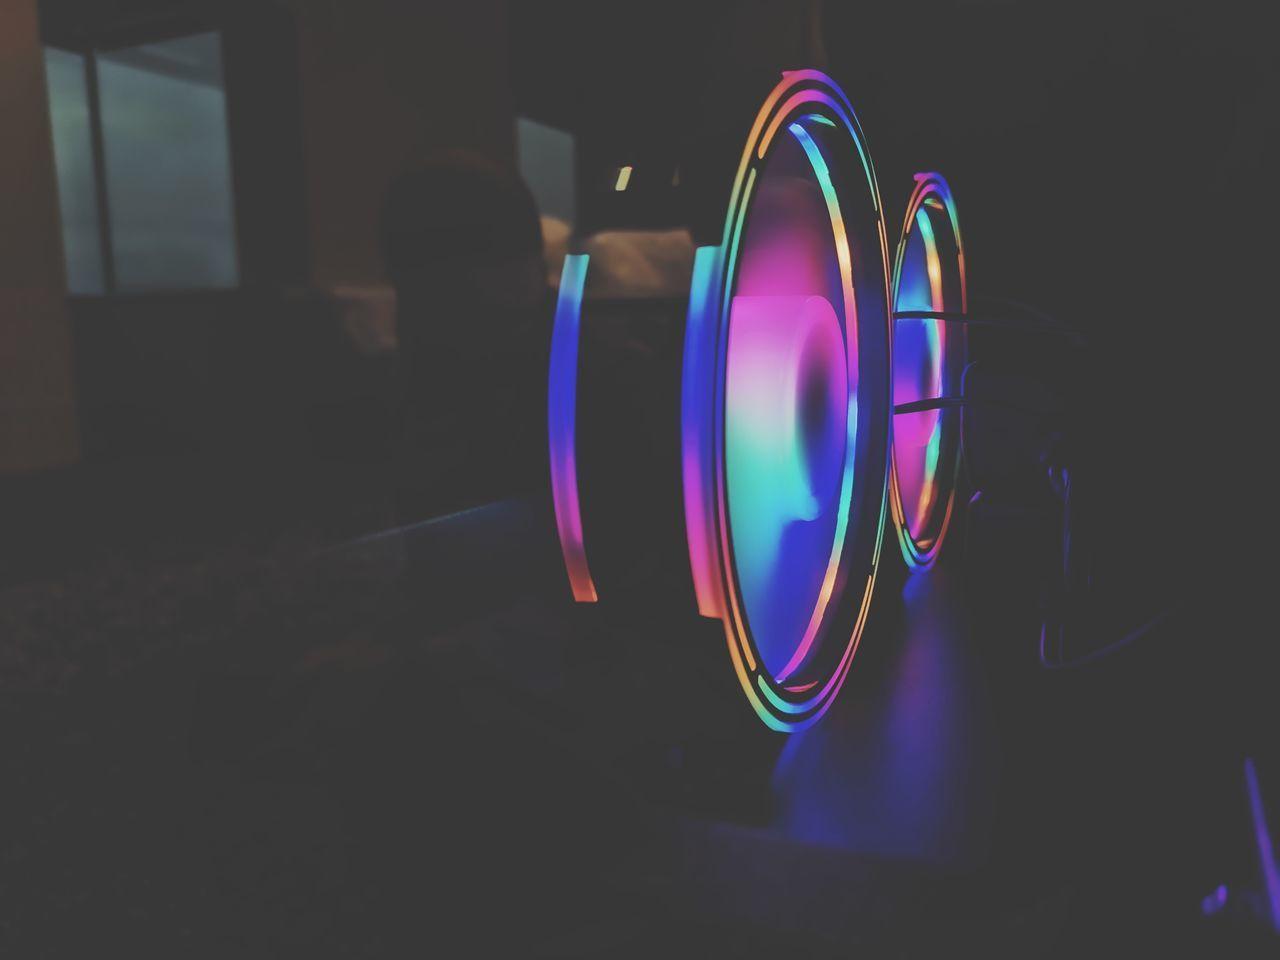 CLOSE-UP OF ILLUMINATED LIGHTING EQUIPMENT IN DARK